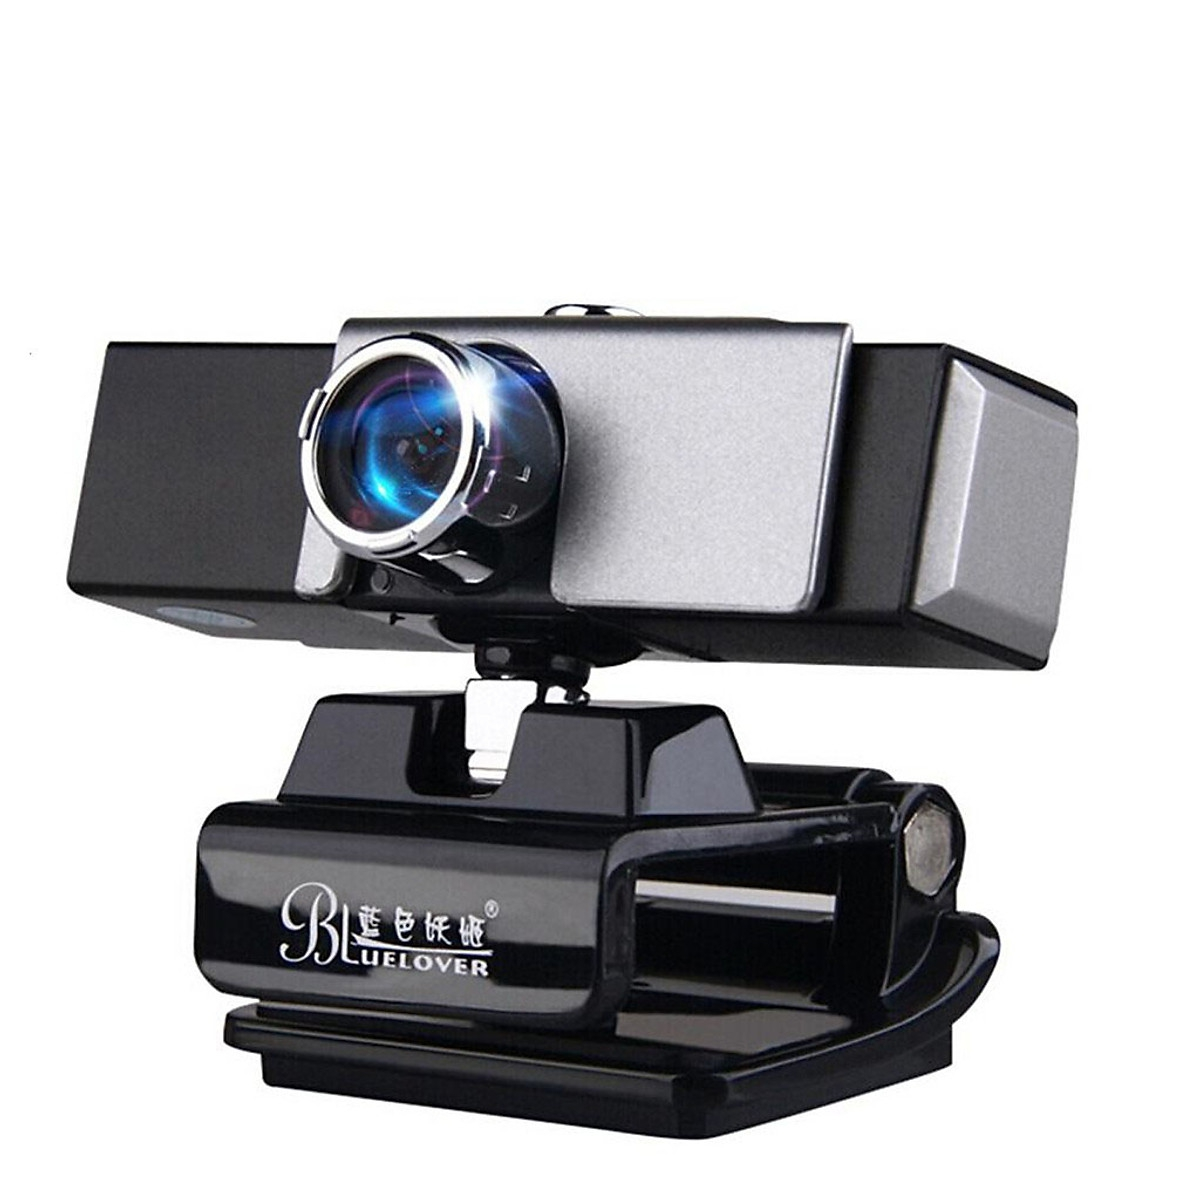 Webcam Máy Tính T3200 Cho PC Laptop